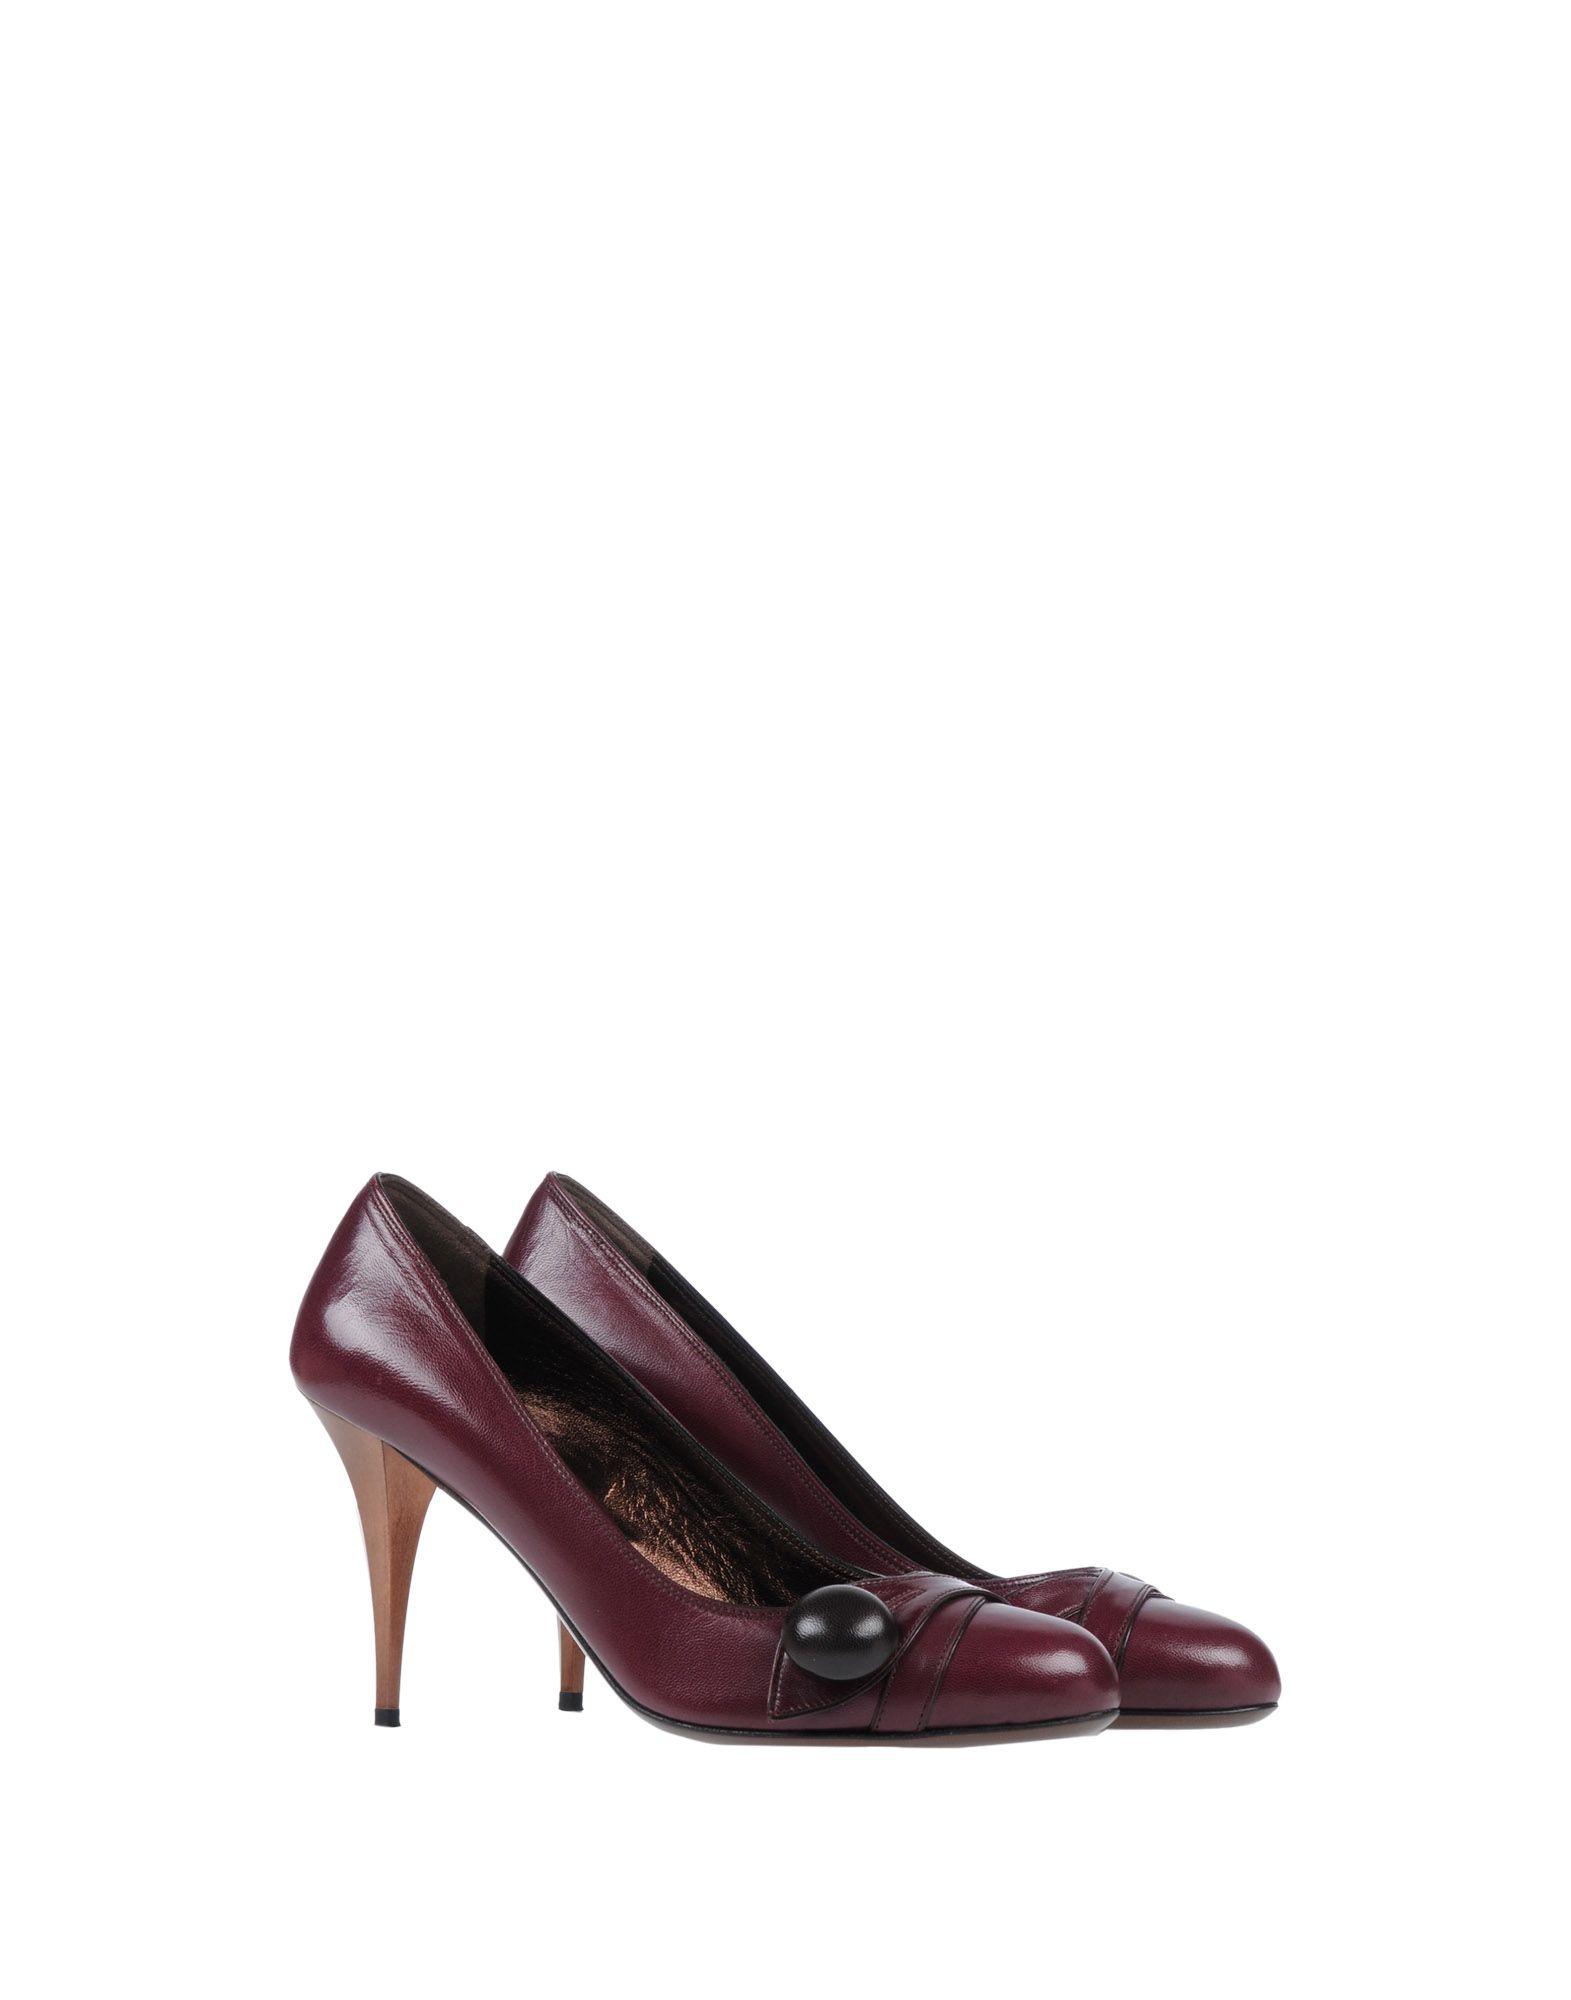 Rabatt Schuhe  Miu Miu Pumps Damen  Schuhe 11470698WV c0d2b2